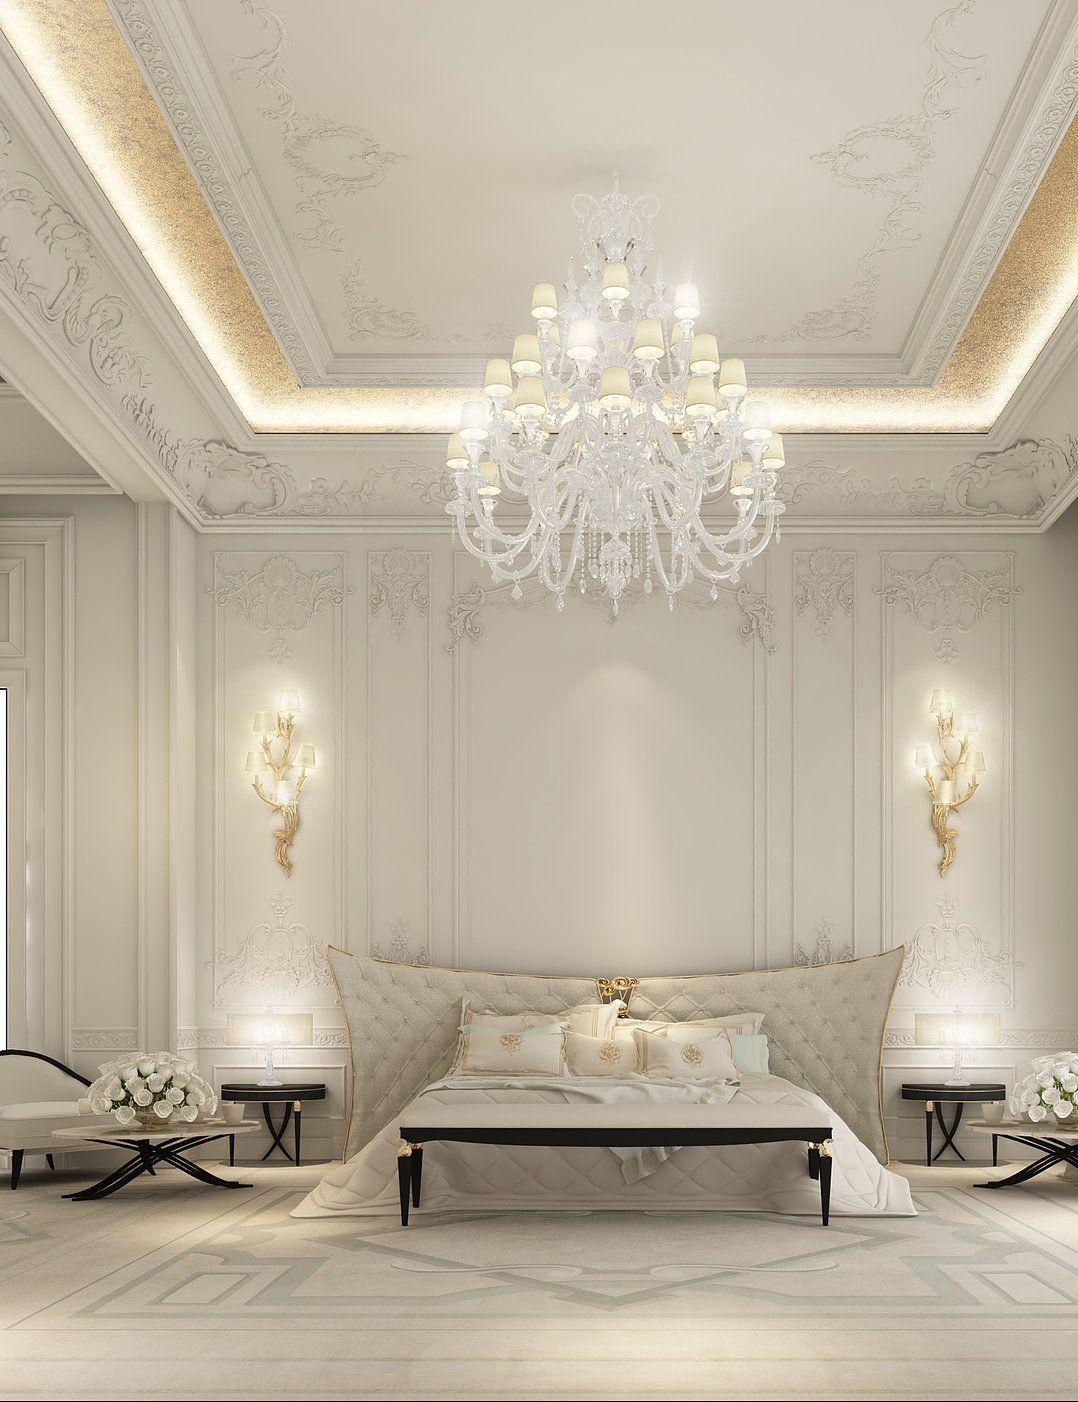 Bathroom Design Companies Interior Design Package Includes Majlis Designs Dining Area